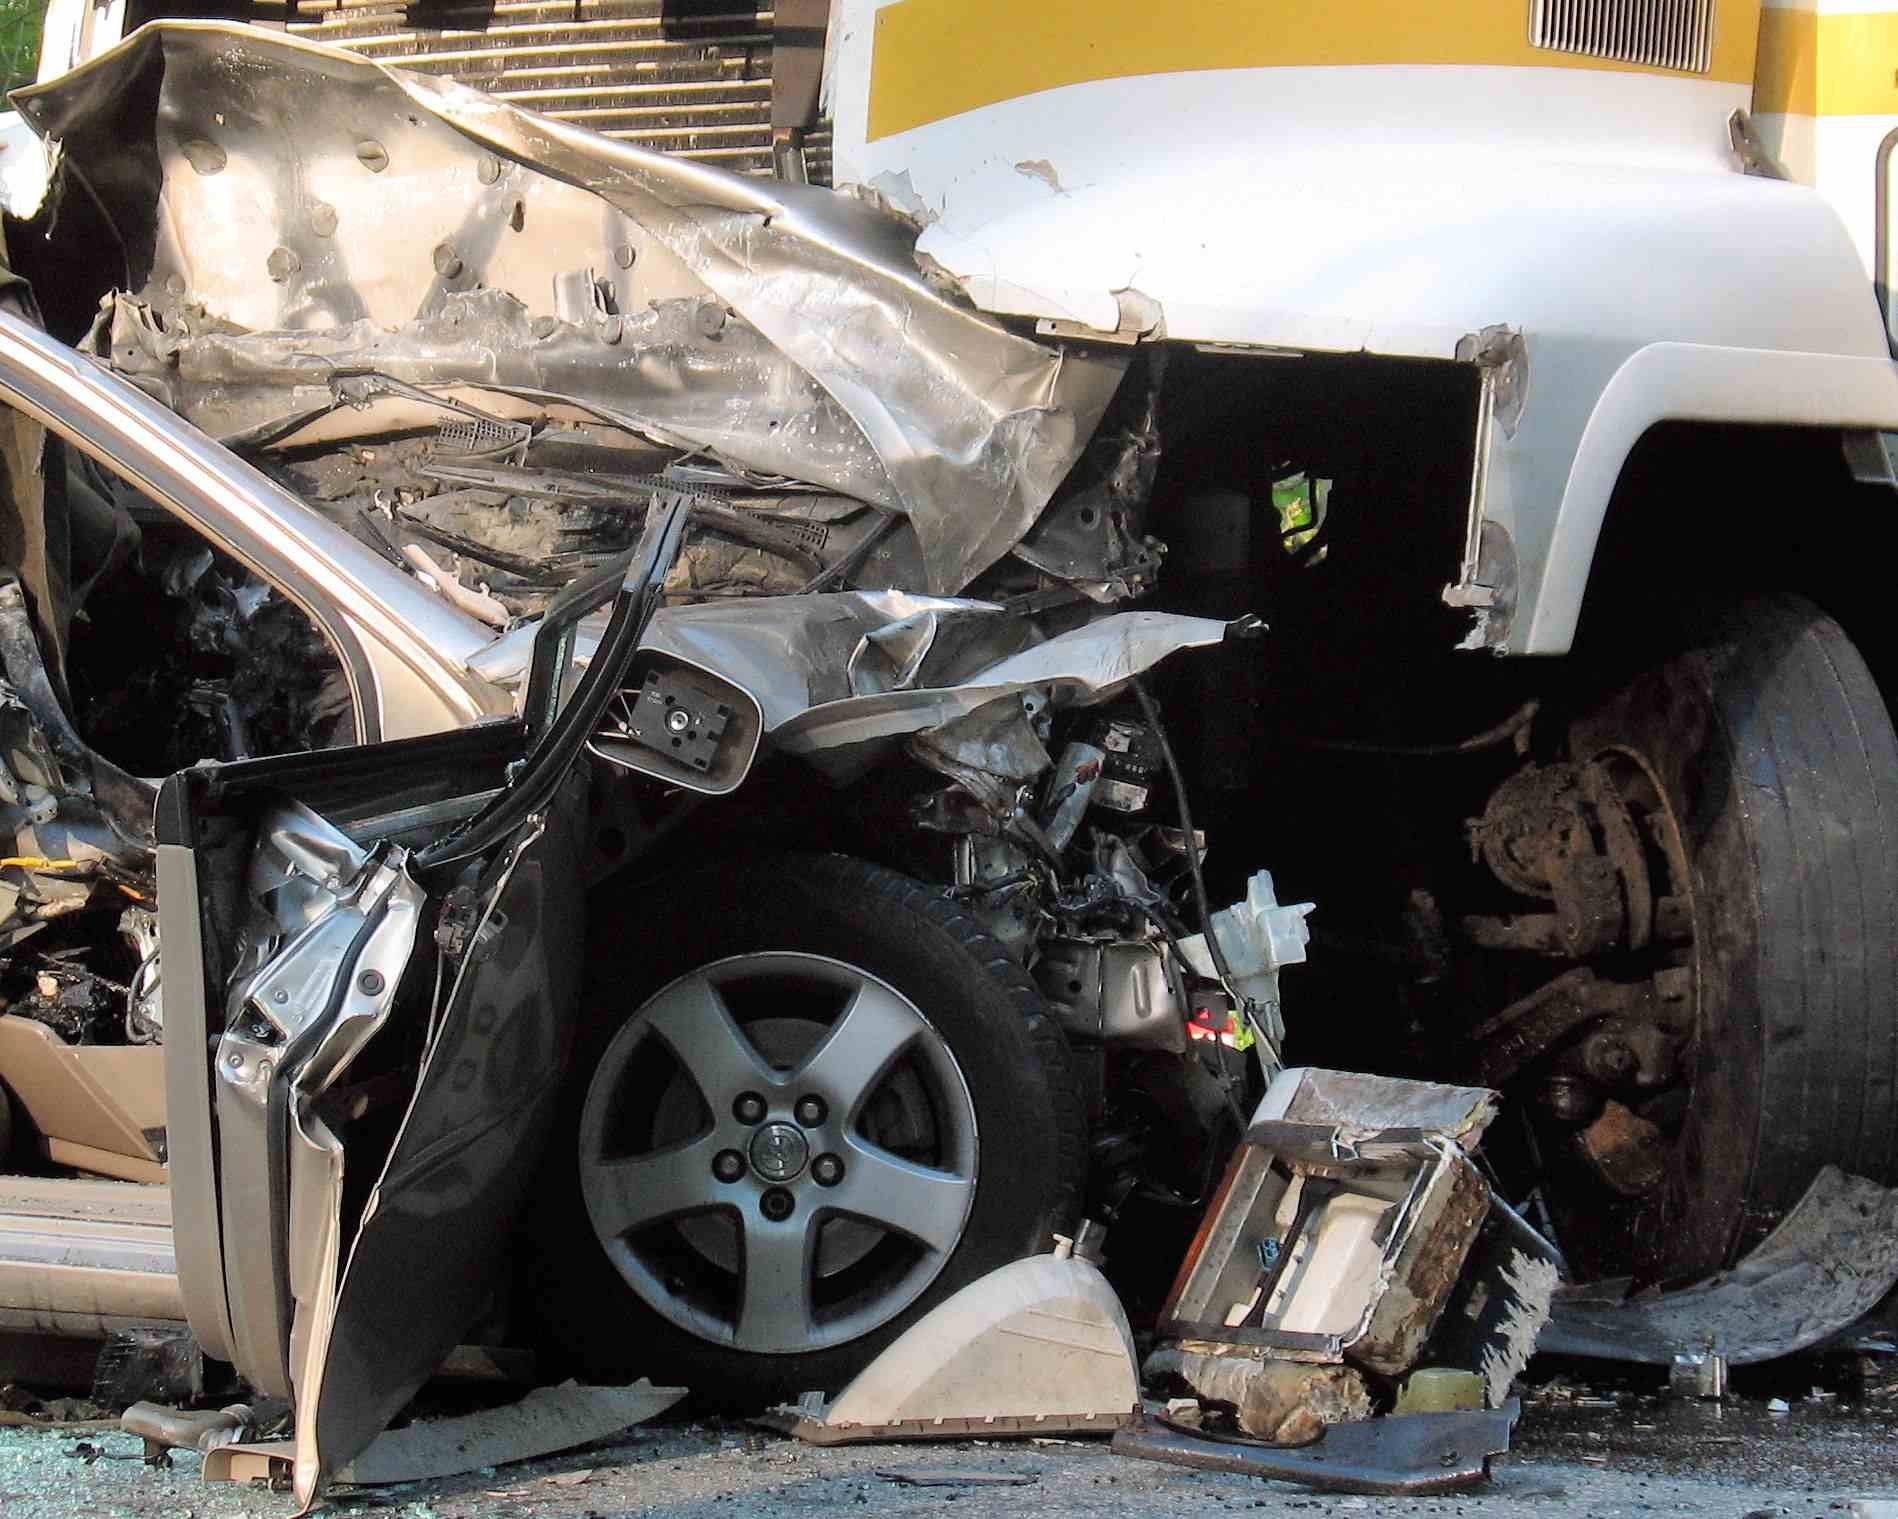 New York Auto Accident Lawyer David Perecman Discusses TwoCar Crash Involving Former Pittsburgh